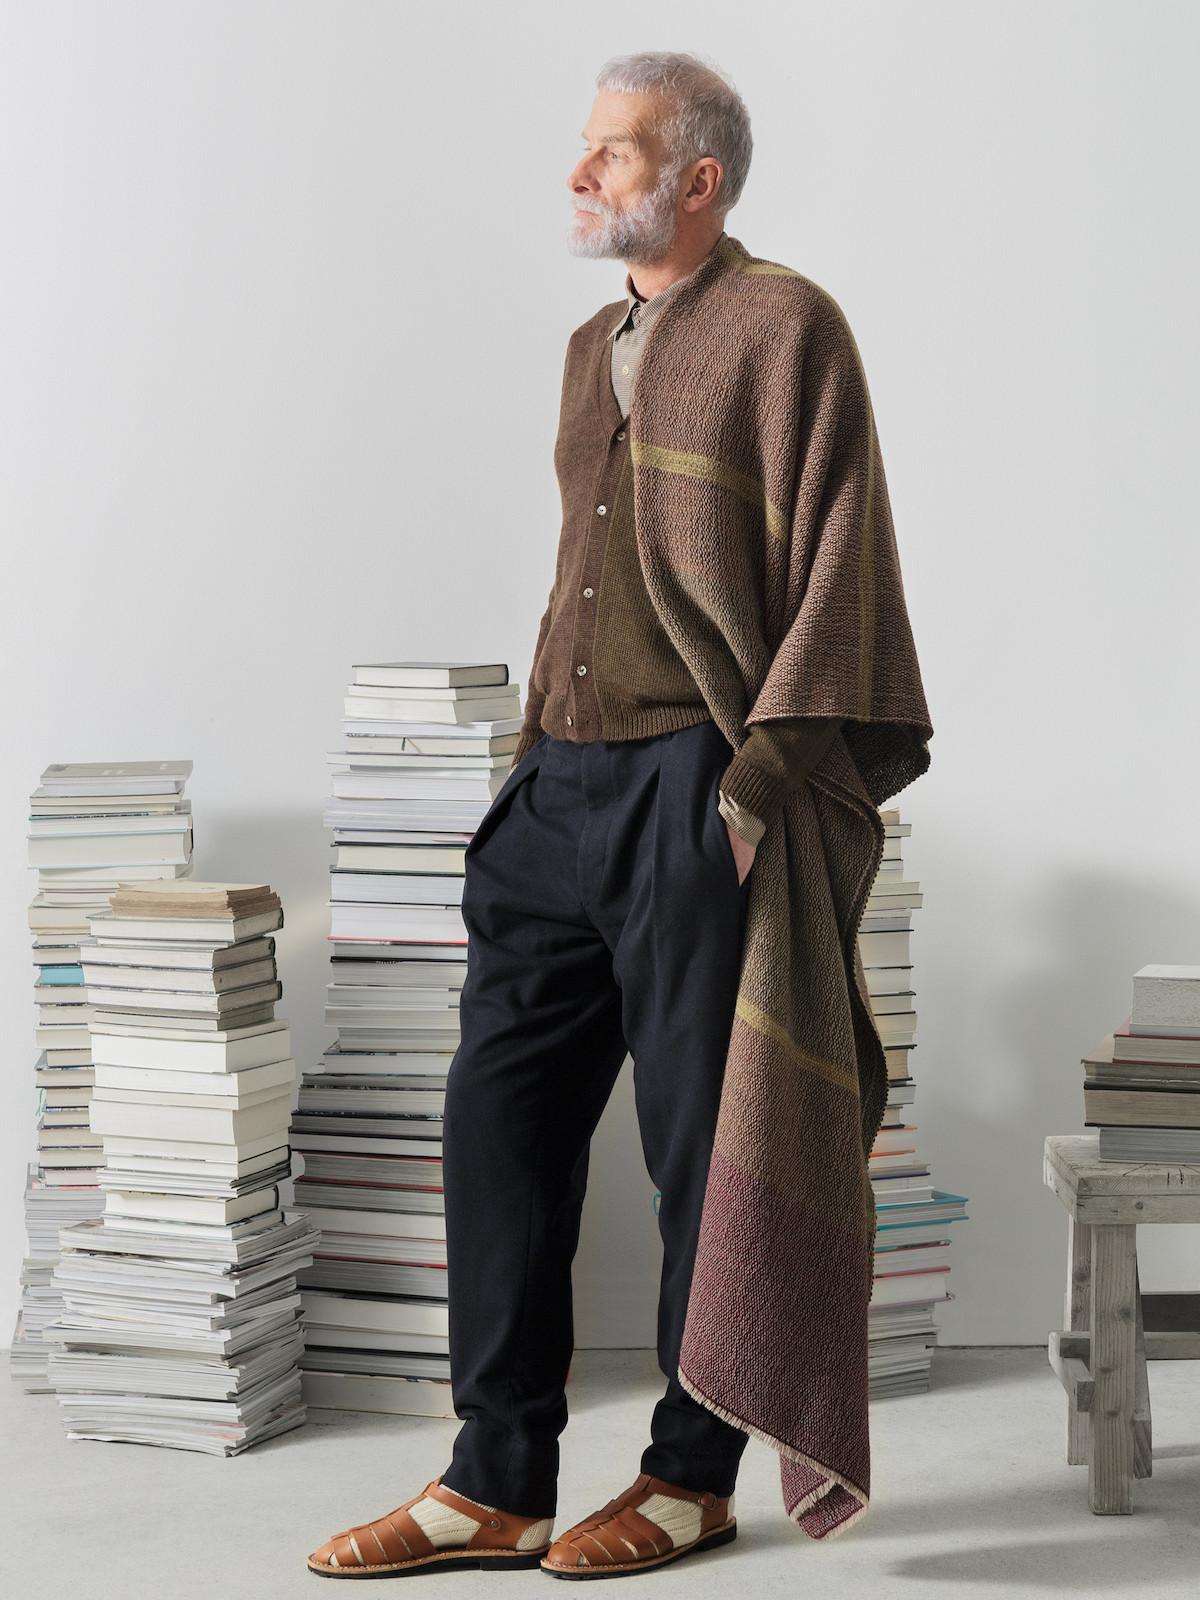 Handloomed blanket Image